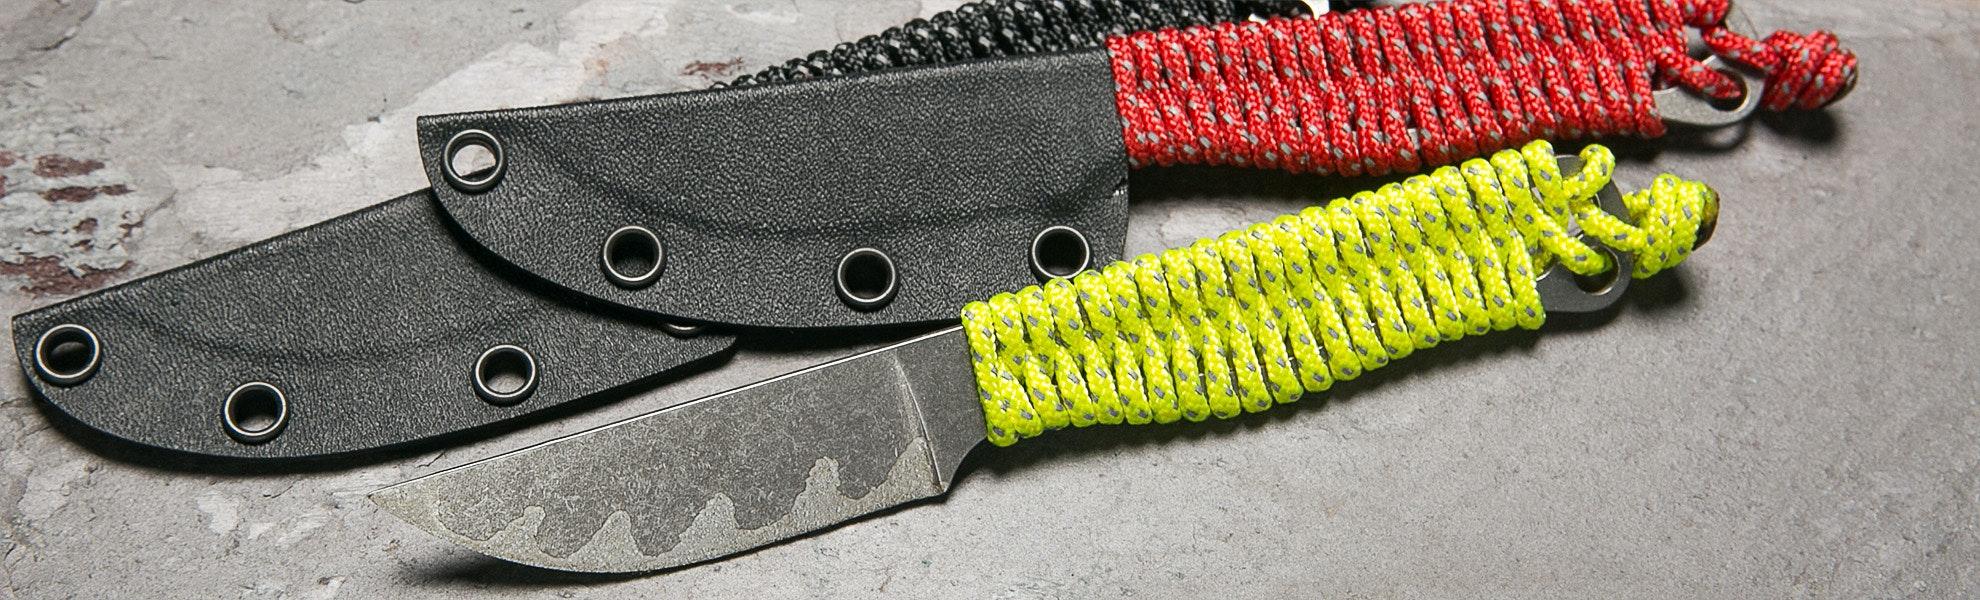 Kestrel Knives Ti Backpacker